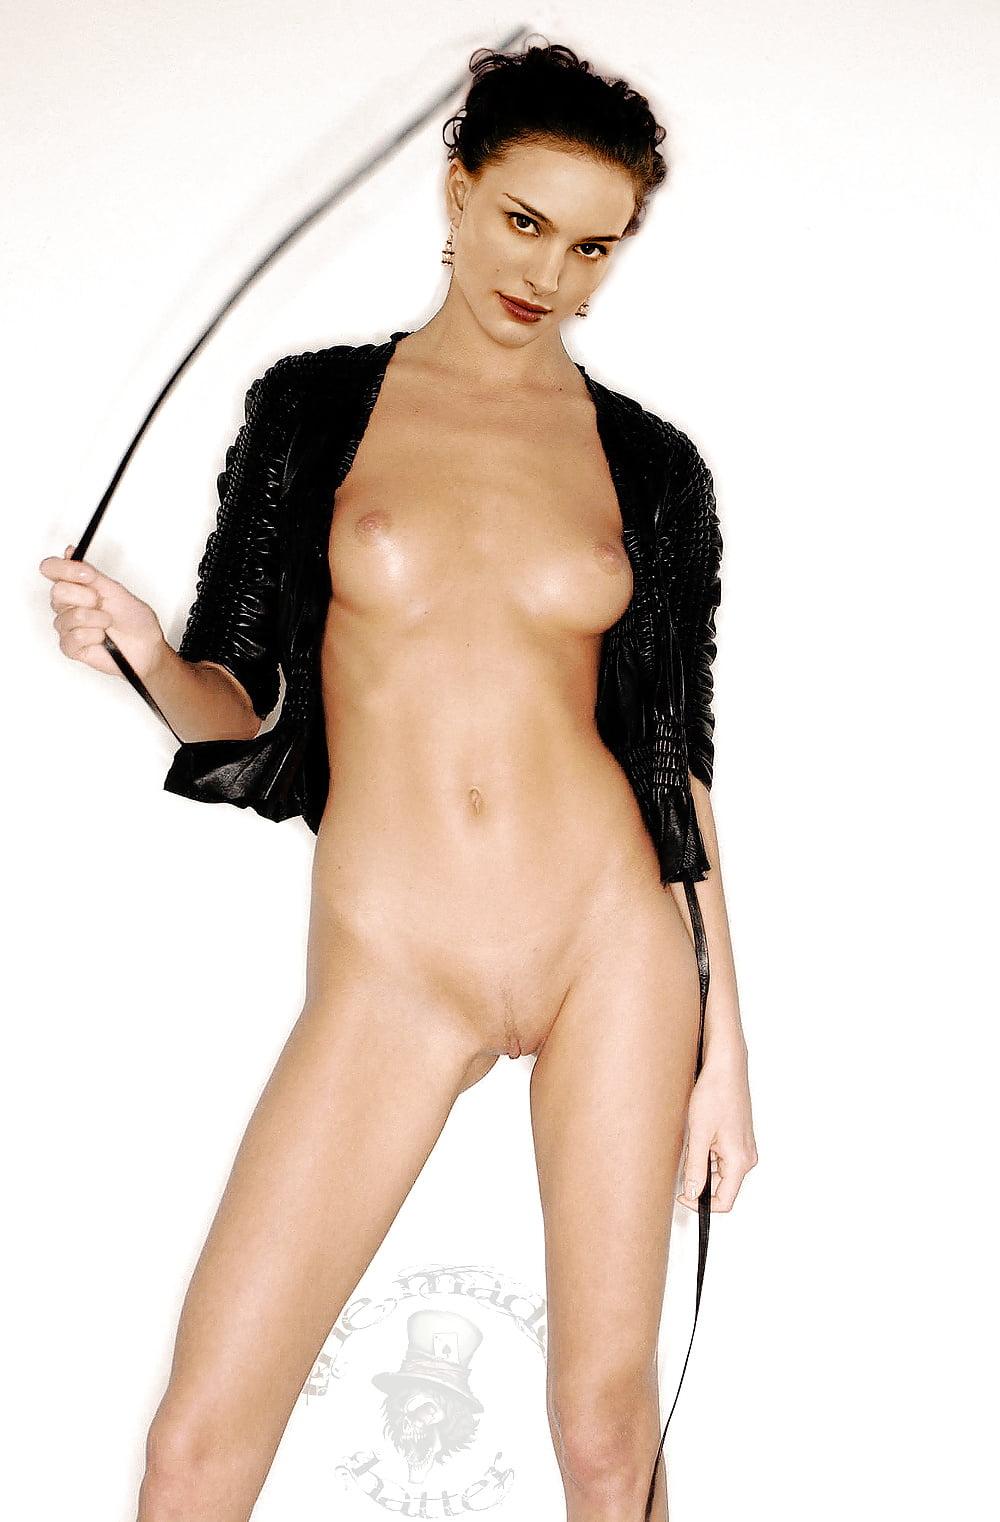 Natalie portman nude hustler photos